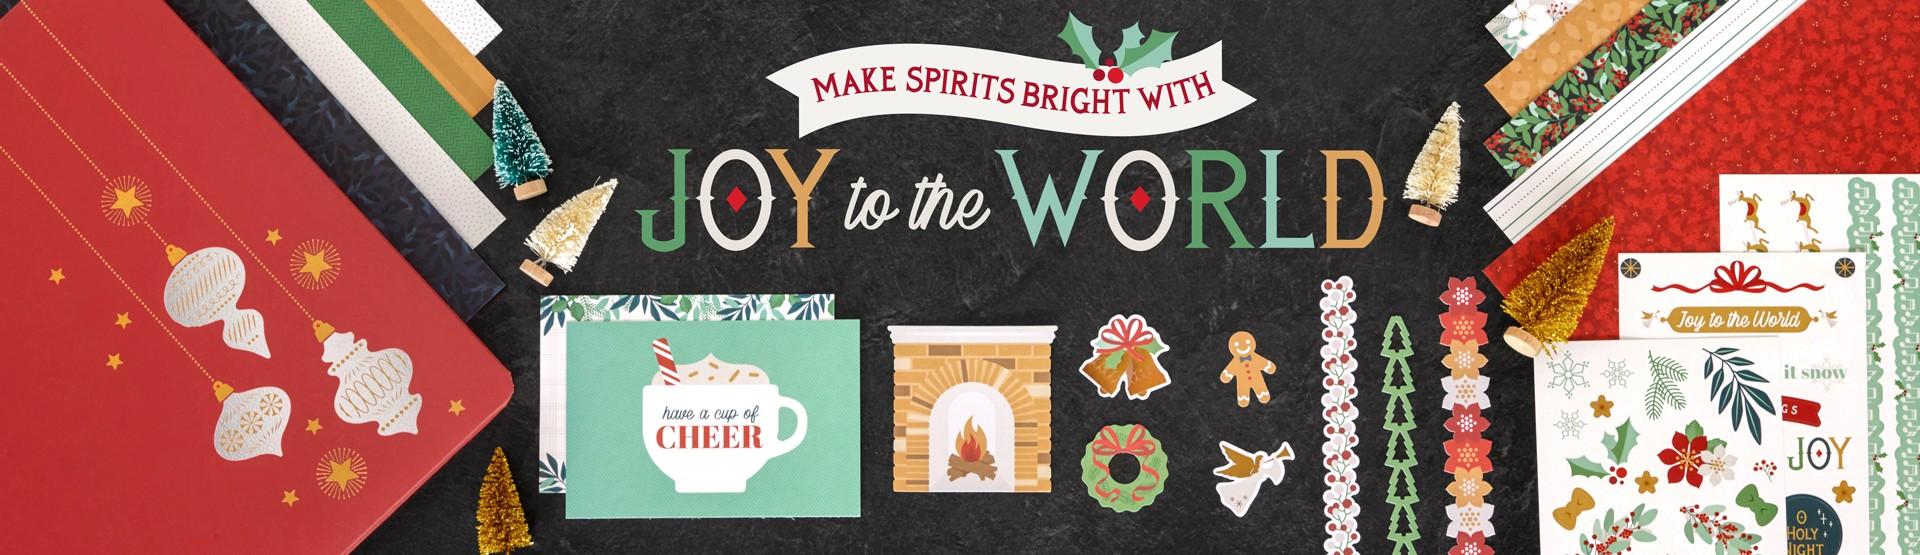 Christmas Scrapbooking Supplies: Joy to the World